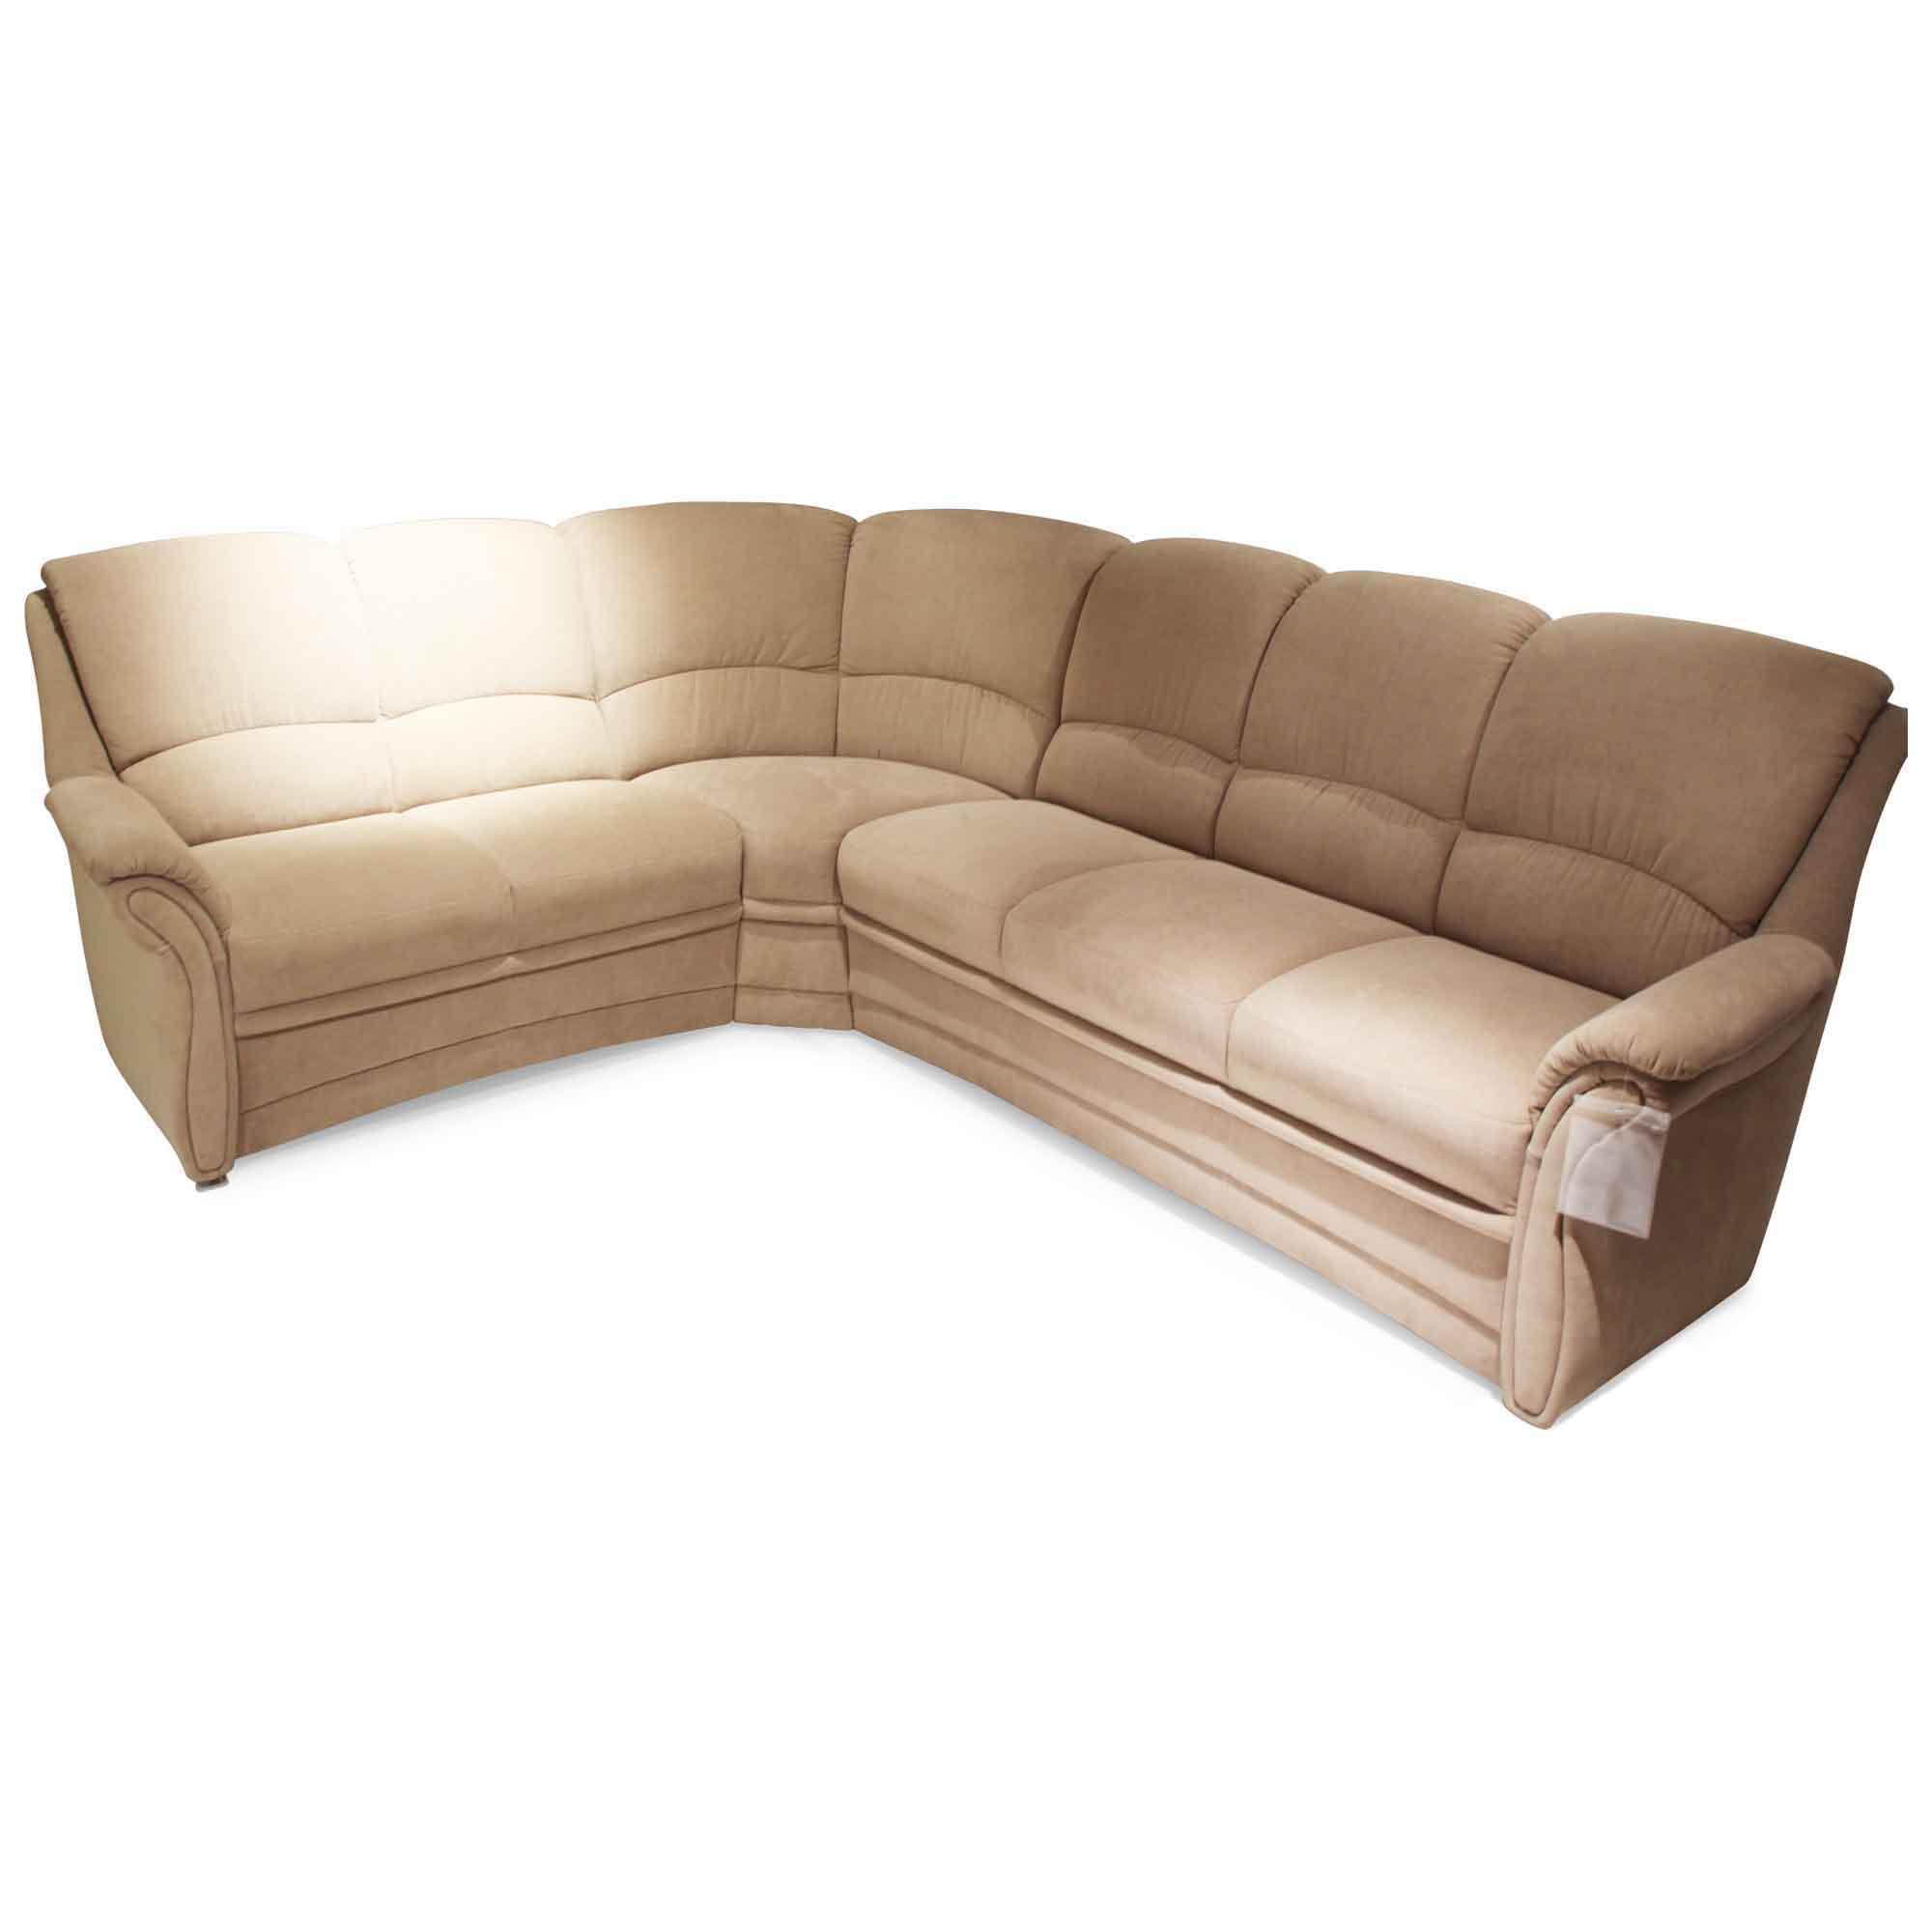 ecksofa linea arco sofas g nstig kaufen m belfirst. Black Bedroom Furniture Sets. Home Design Ideas